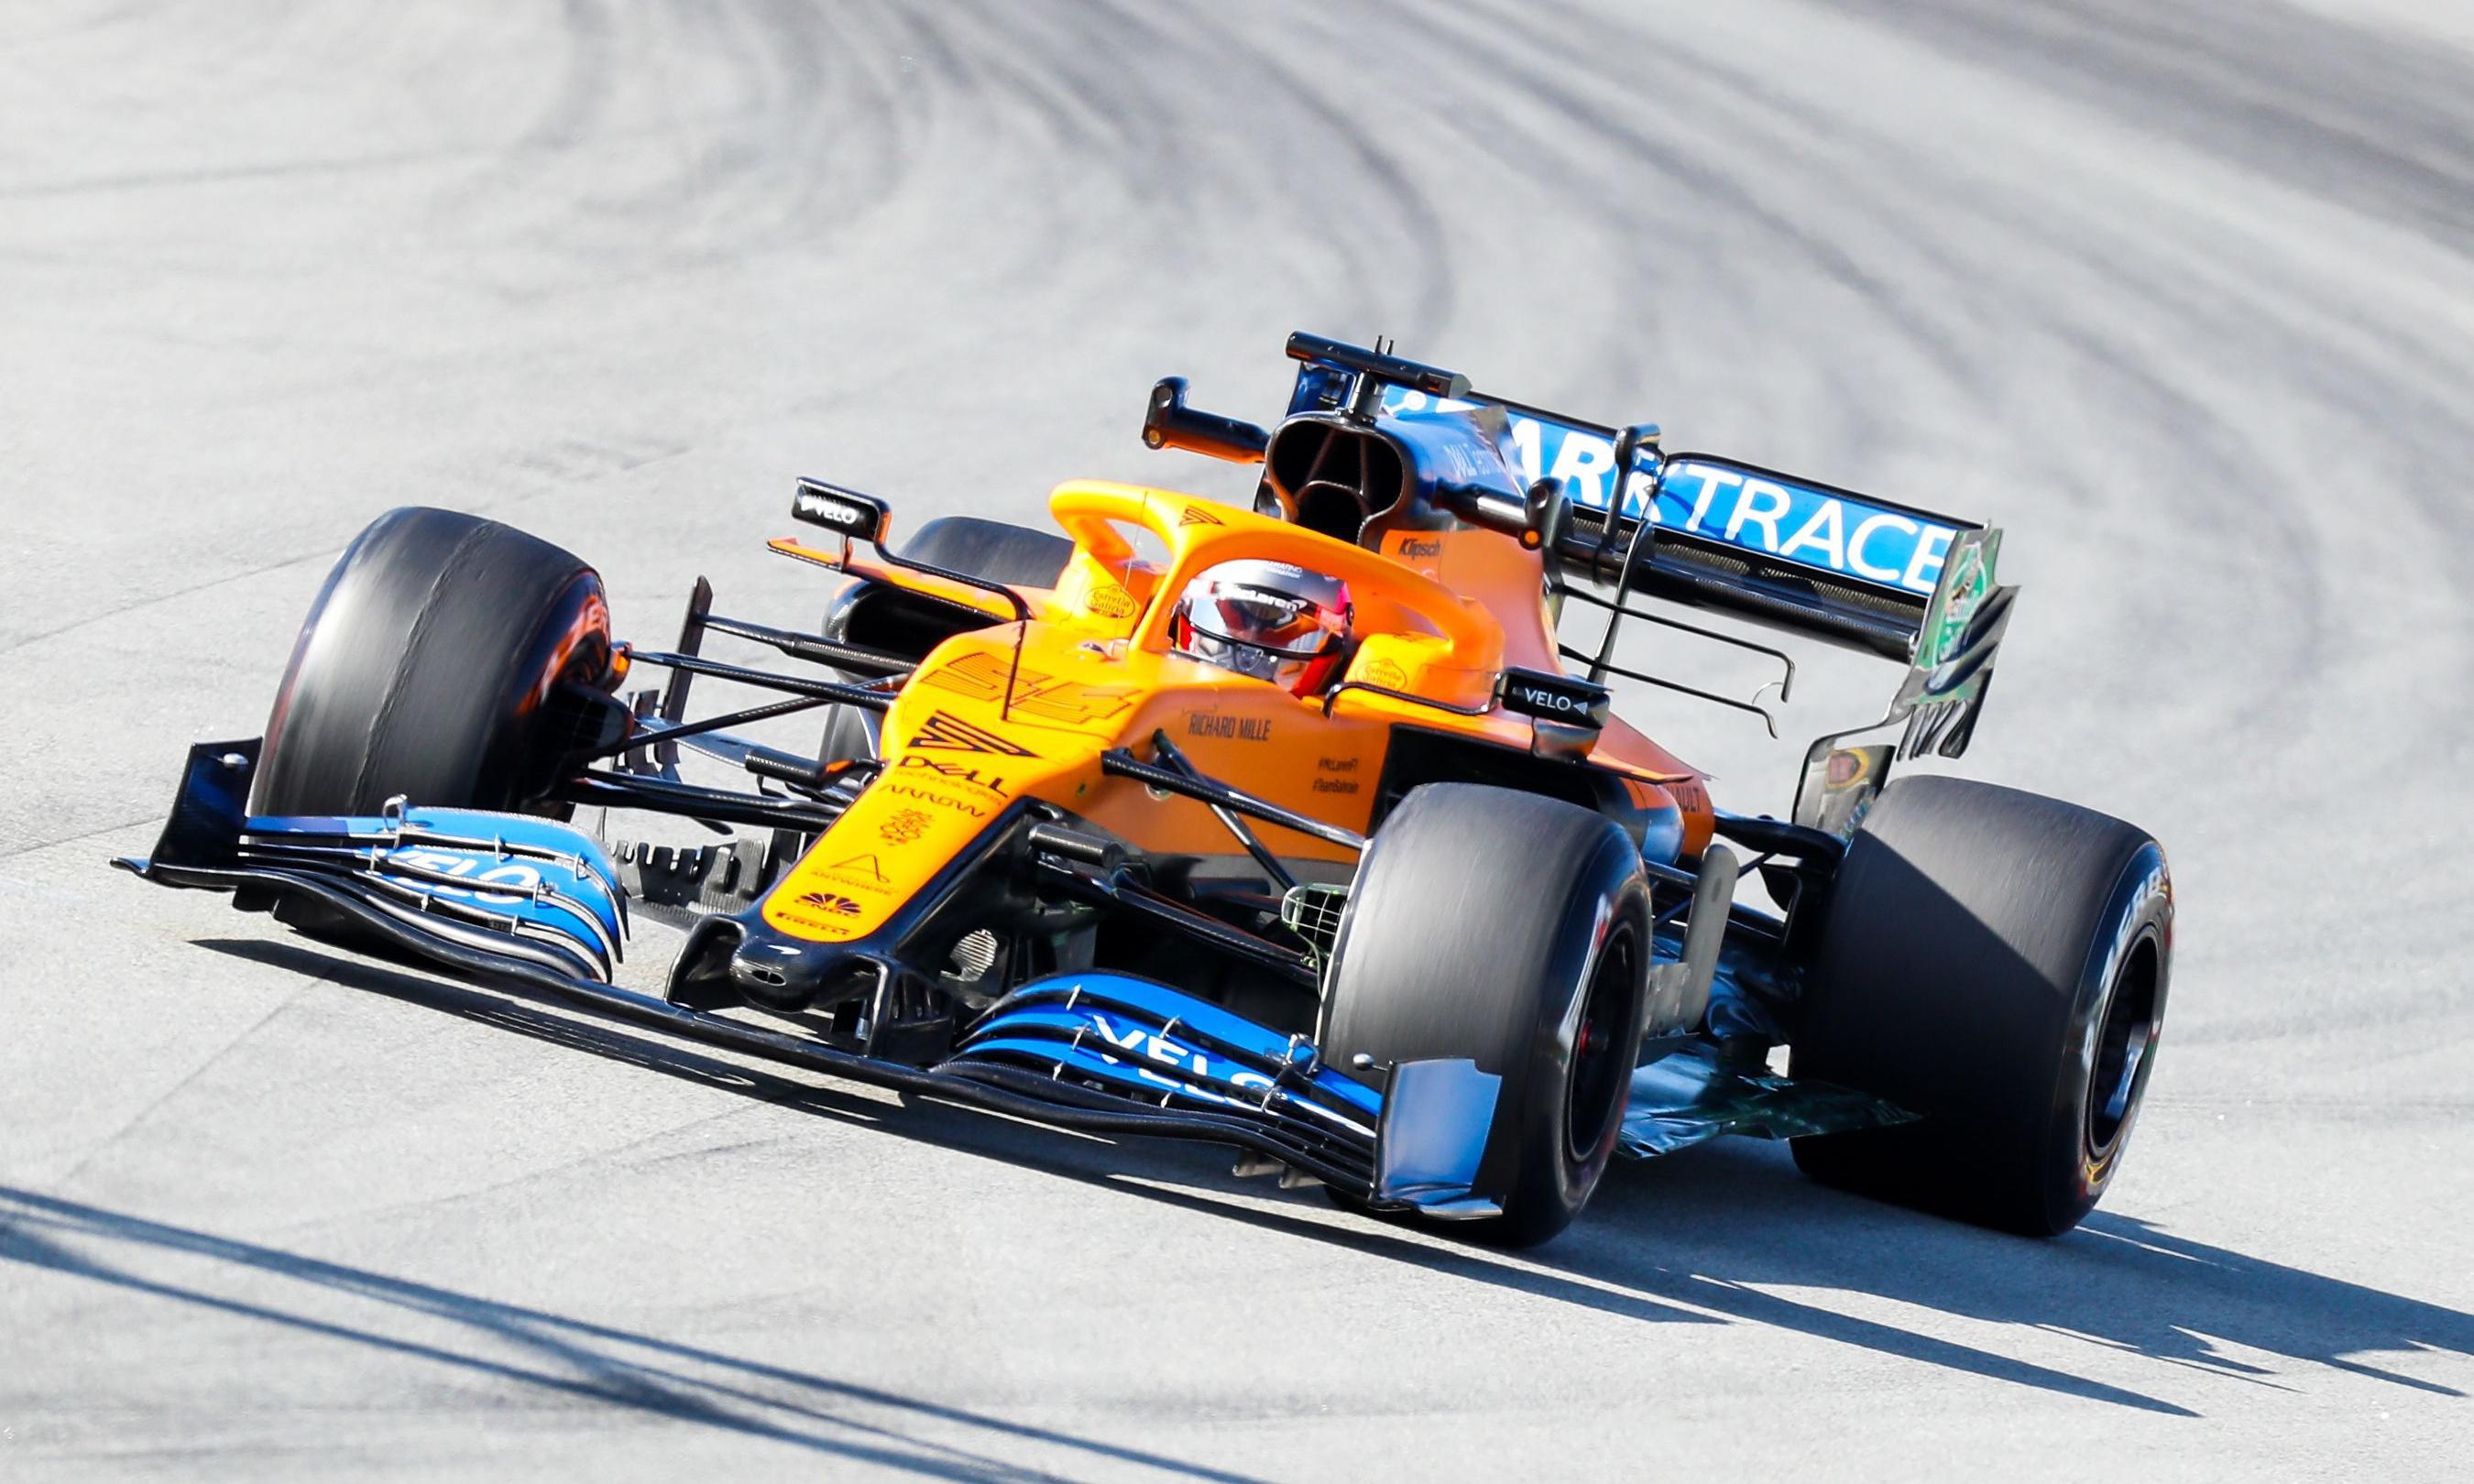 McLaren adopt strict safety policy on spread of coronavirus